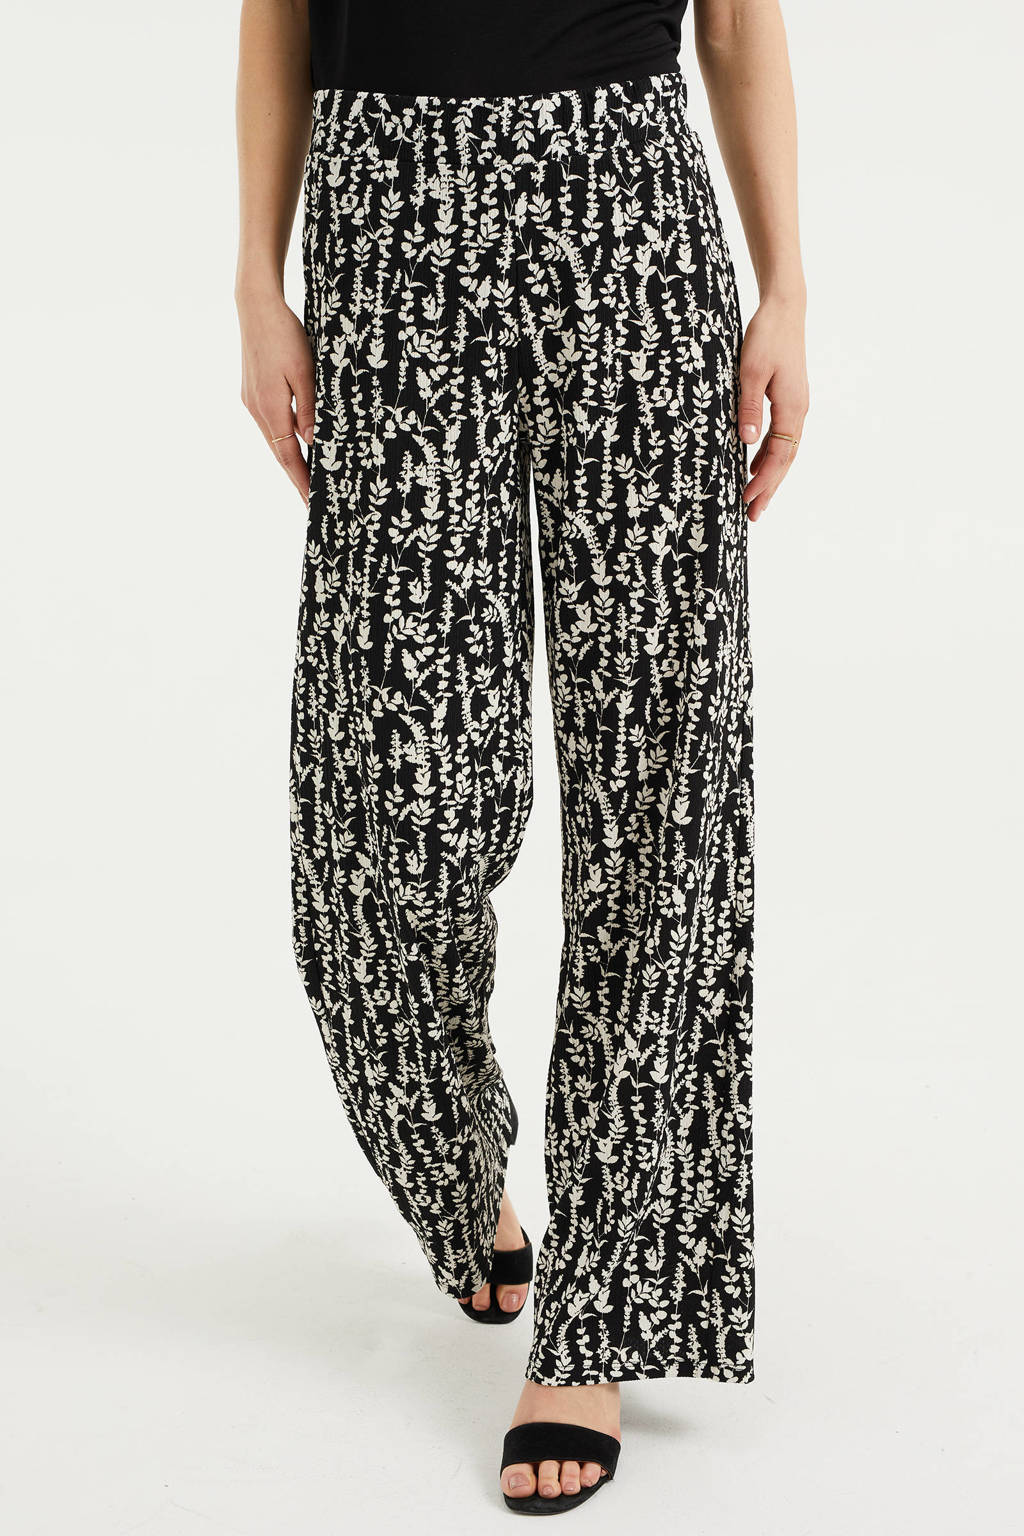 WE Fashion high waist loose fit broek met bladprint en textuur zwart/ecru, Zwart/ecru